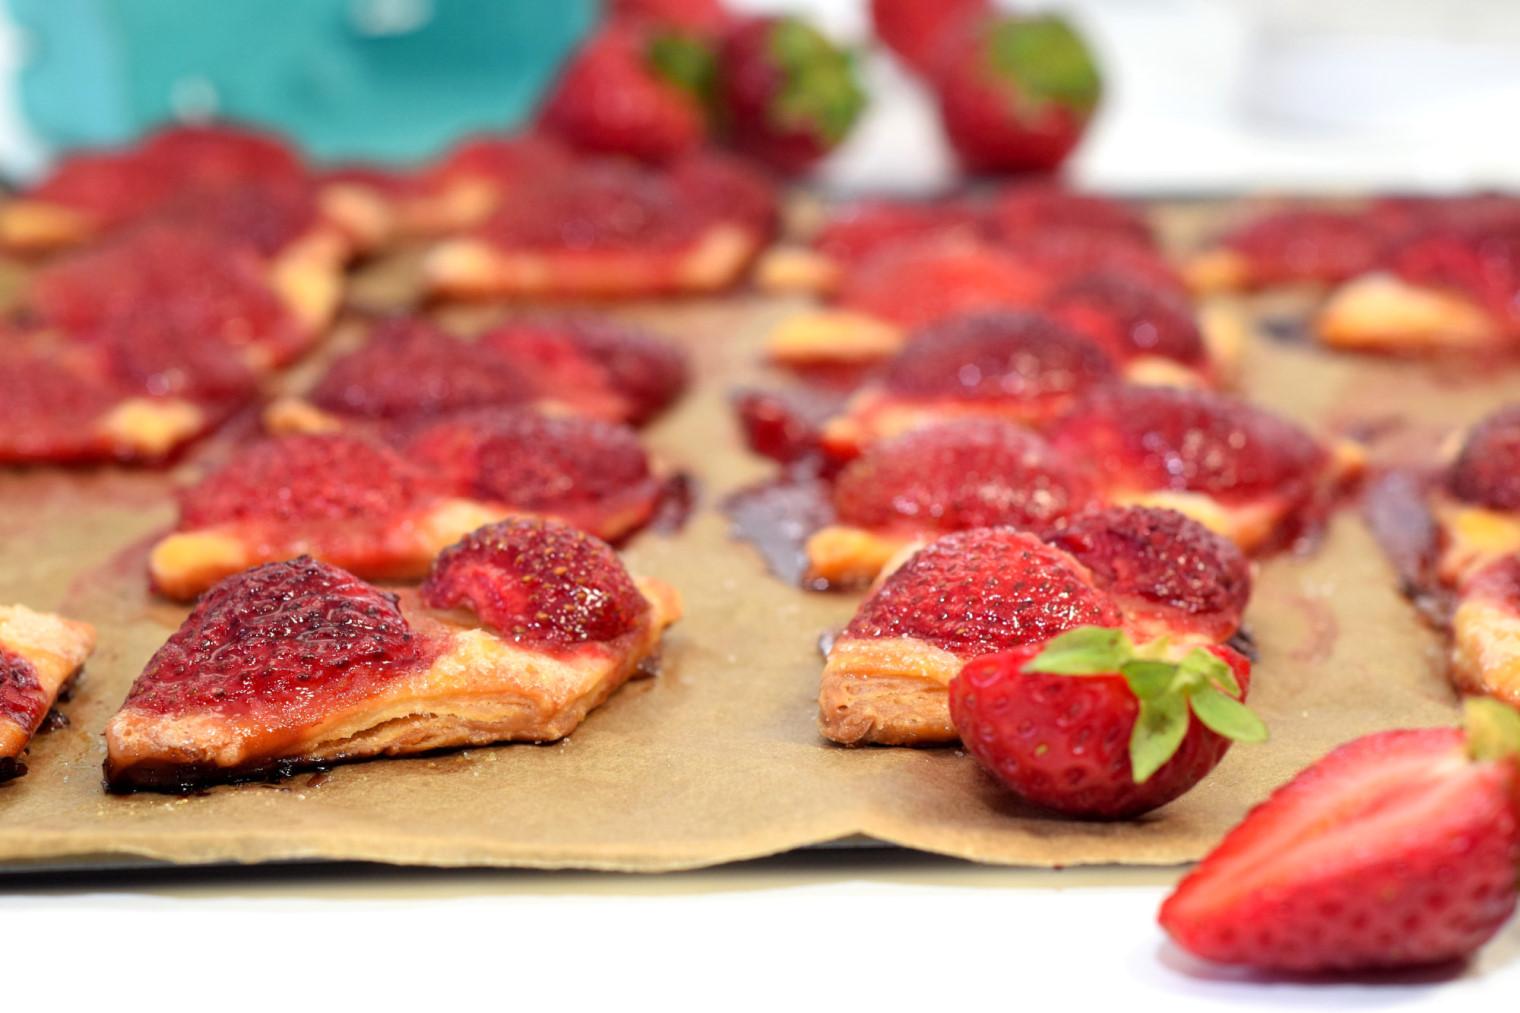 easy bake strawberry squares recipe02